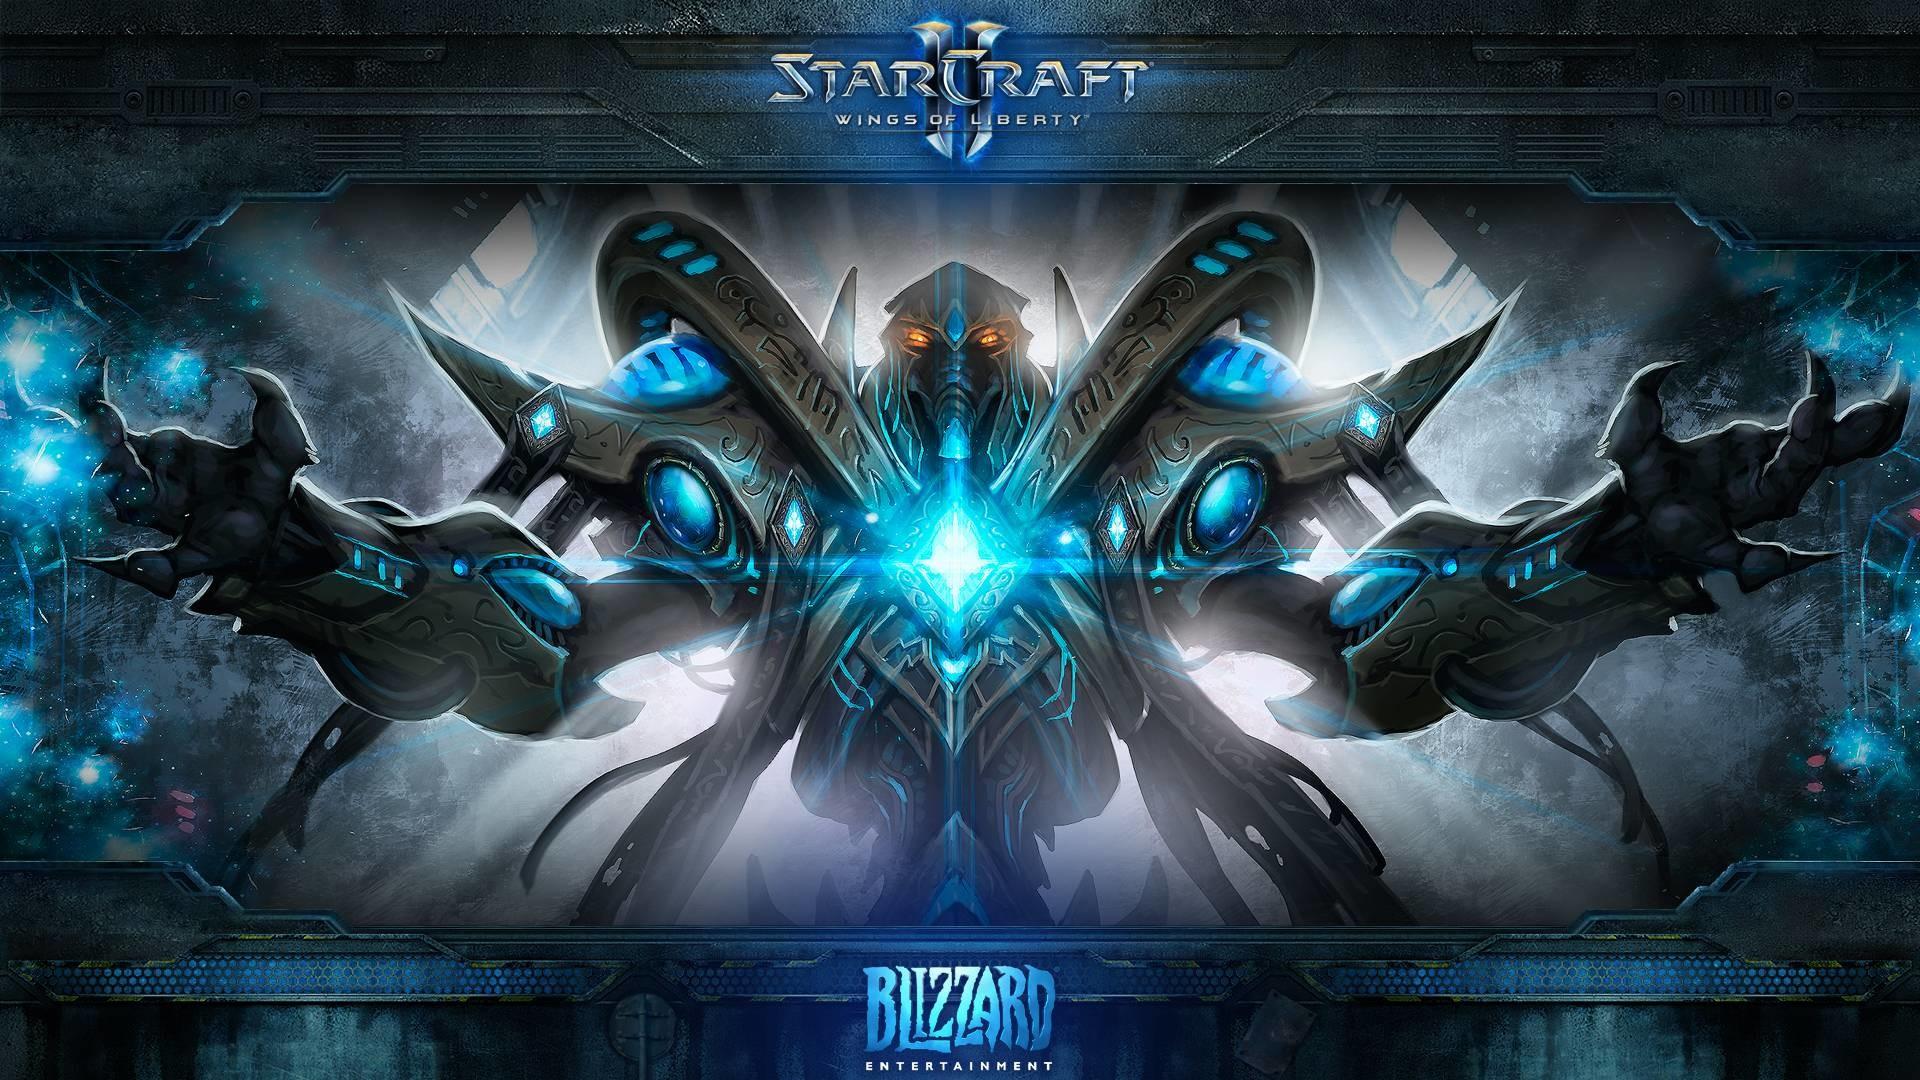 63] Starcraft 2 Wallpapers 1920x1080 on WallpaperSafari 1920x1080